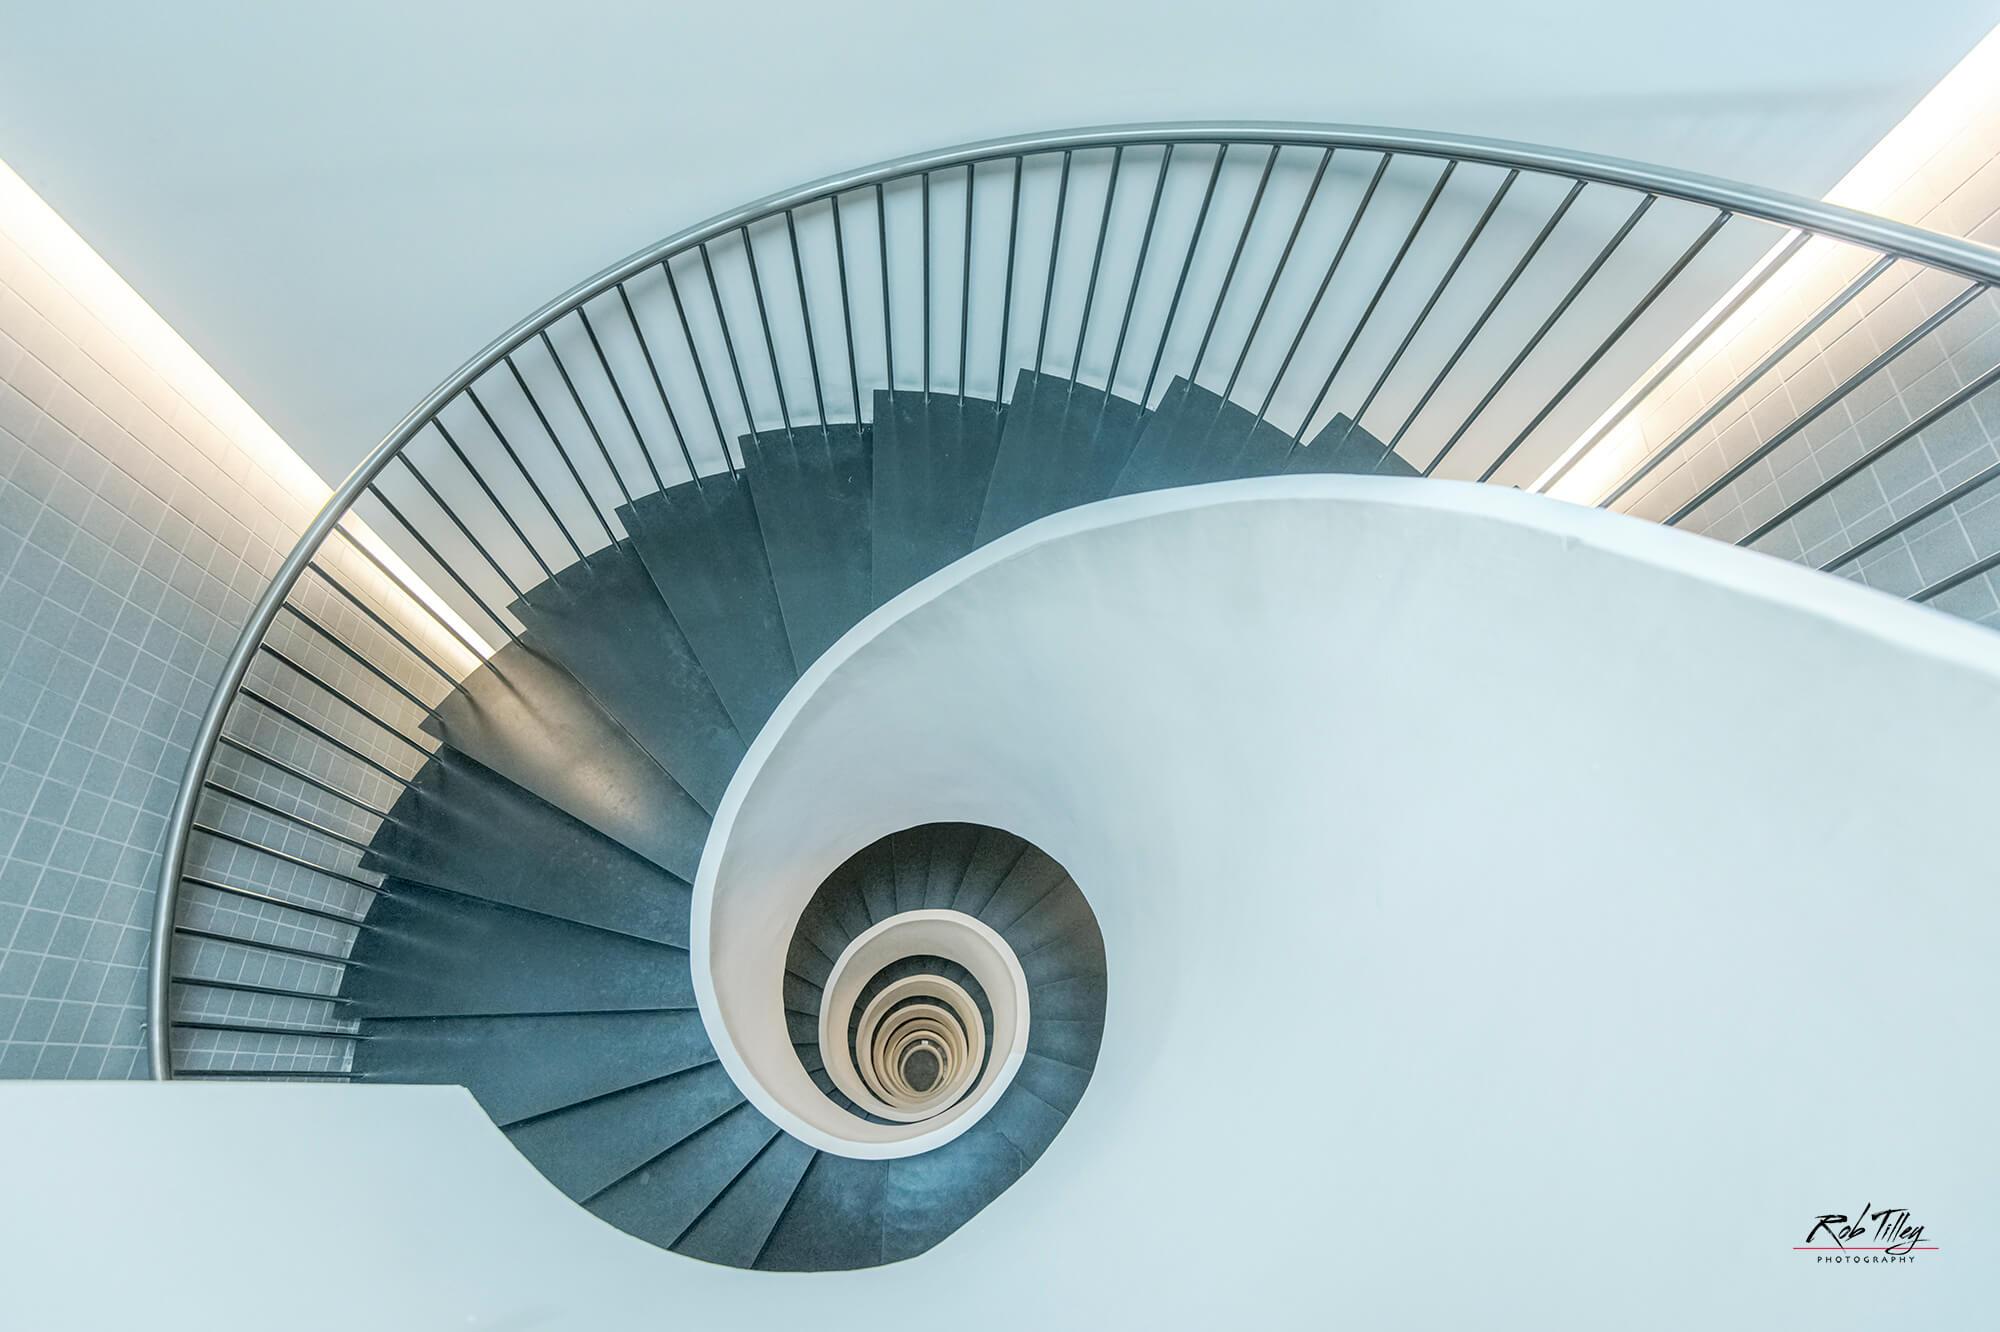 Hotel Staircase III